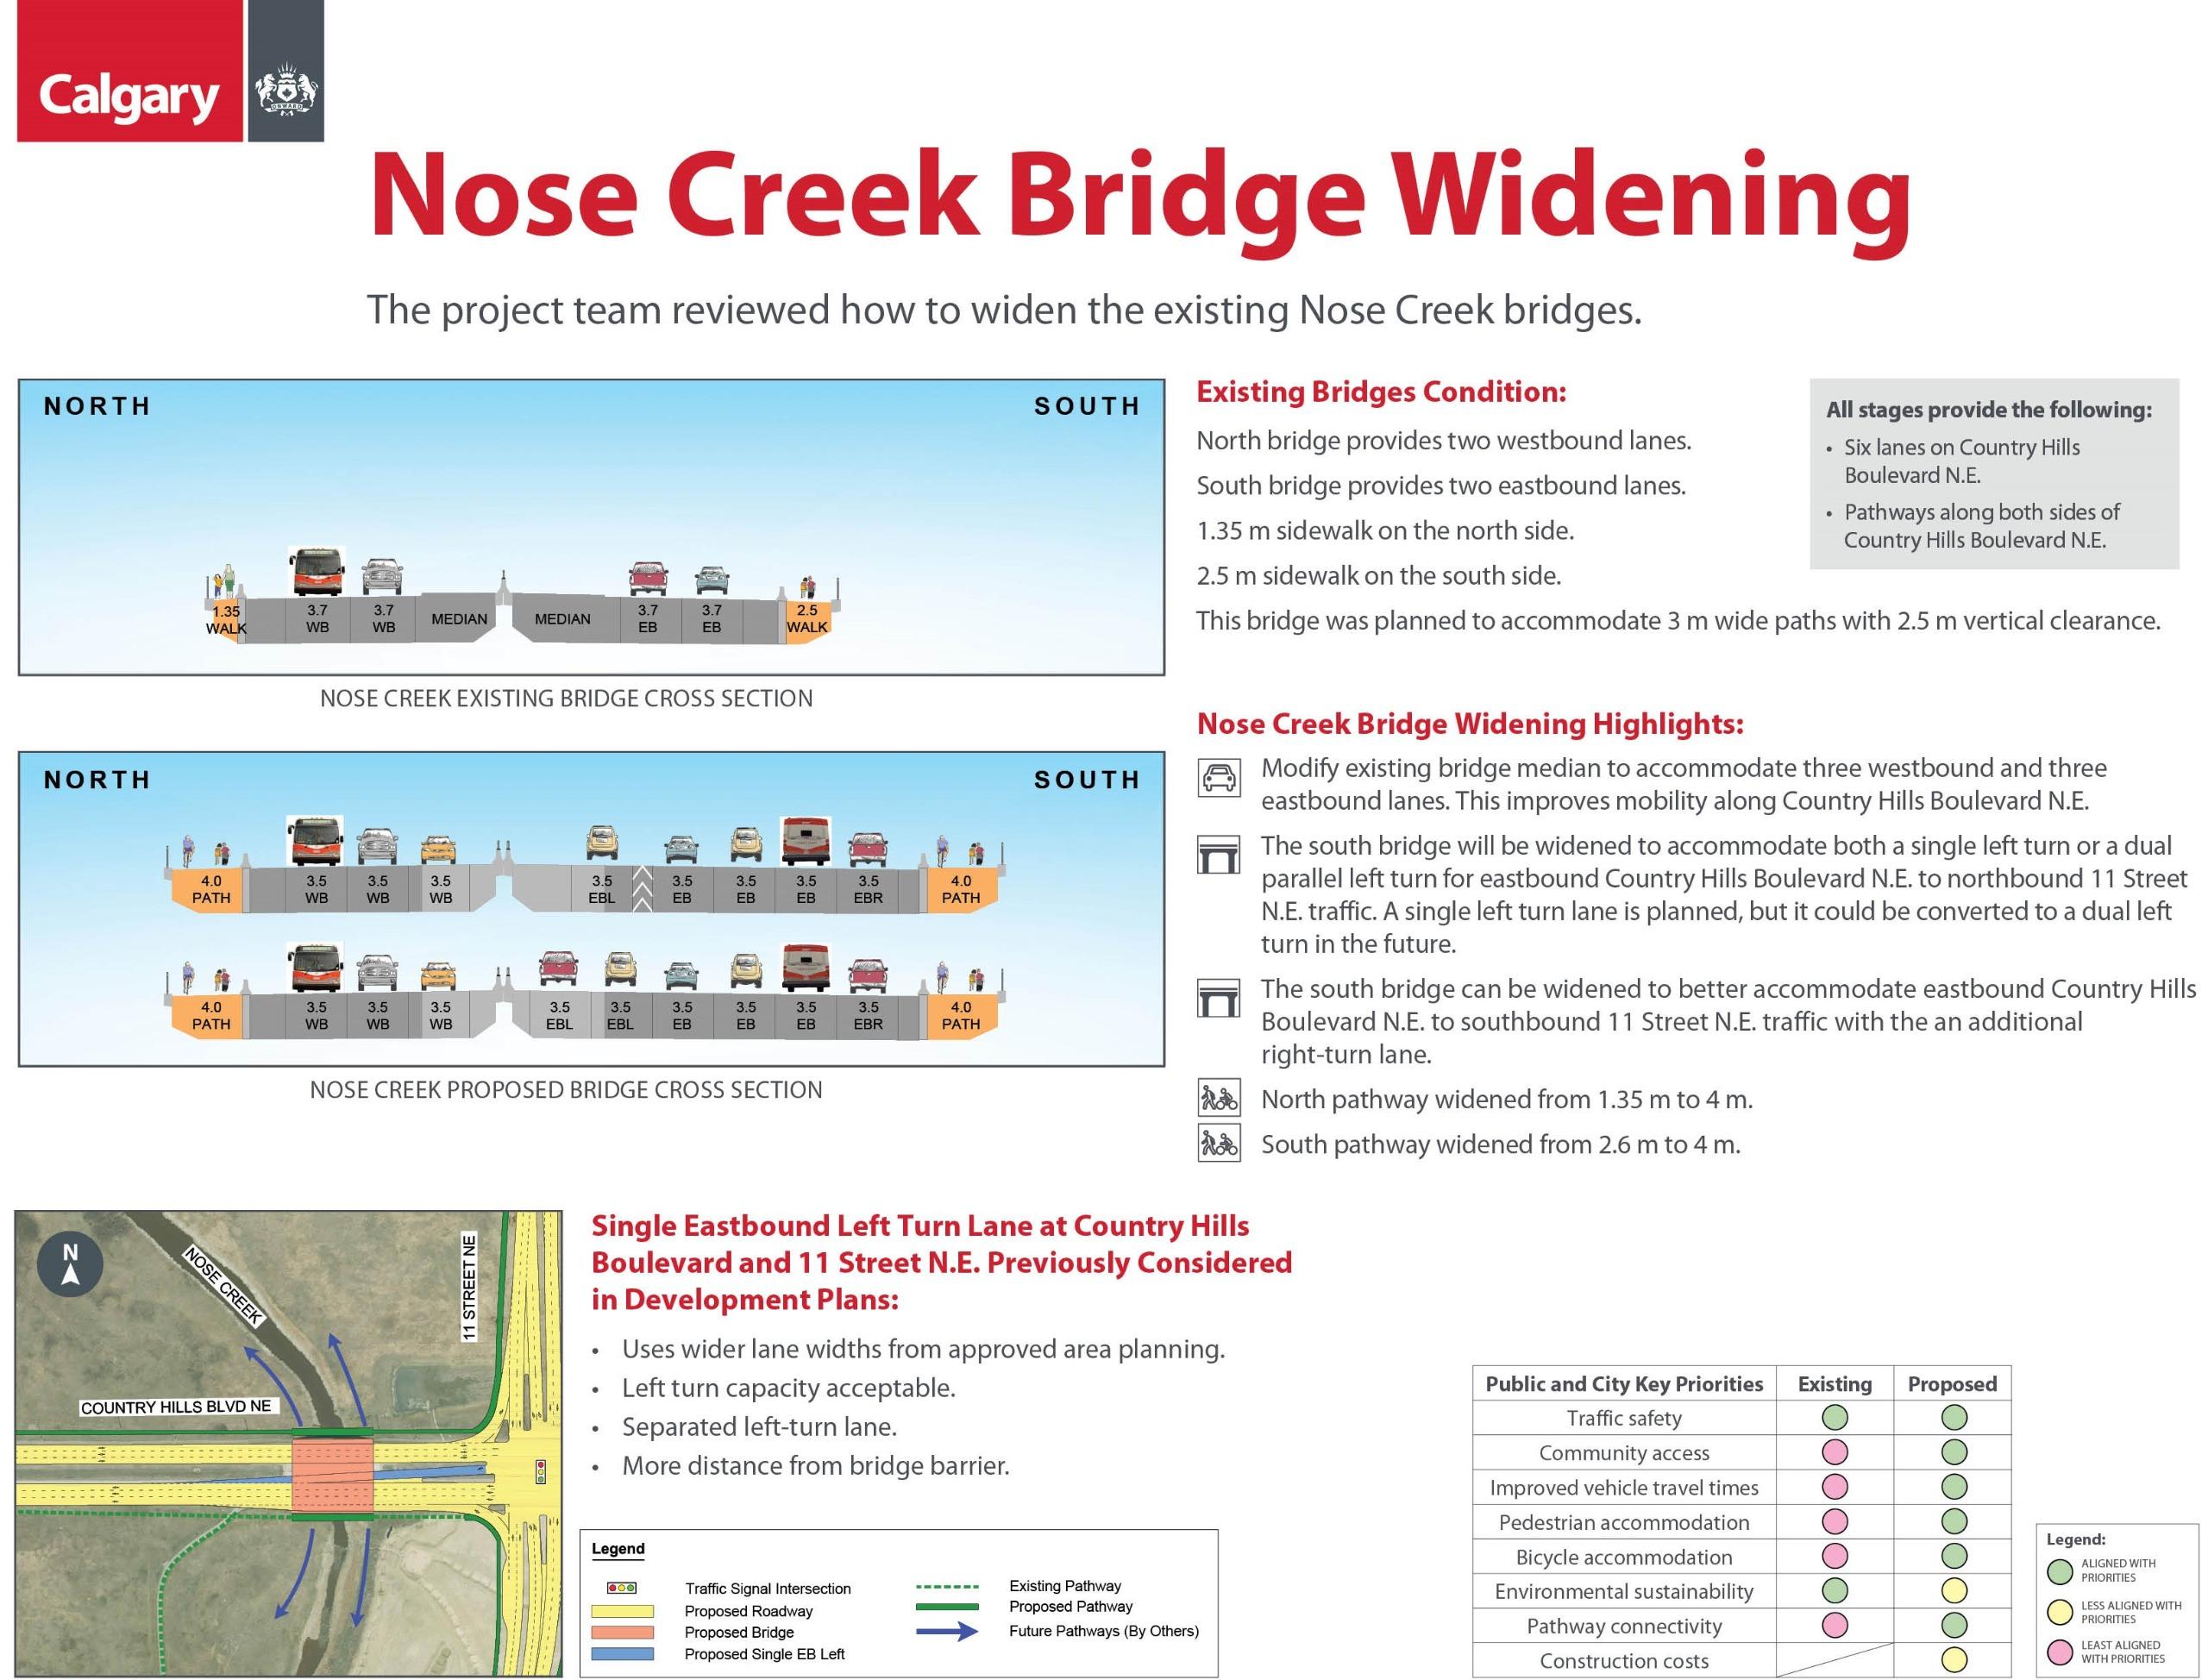 Nose Creek Bridge